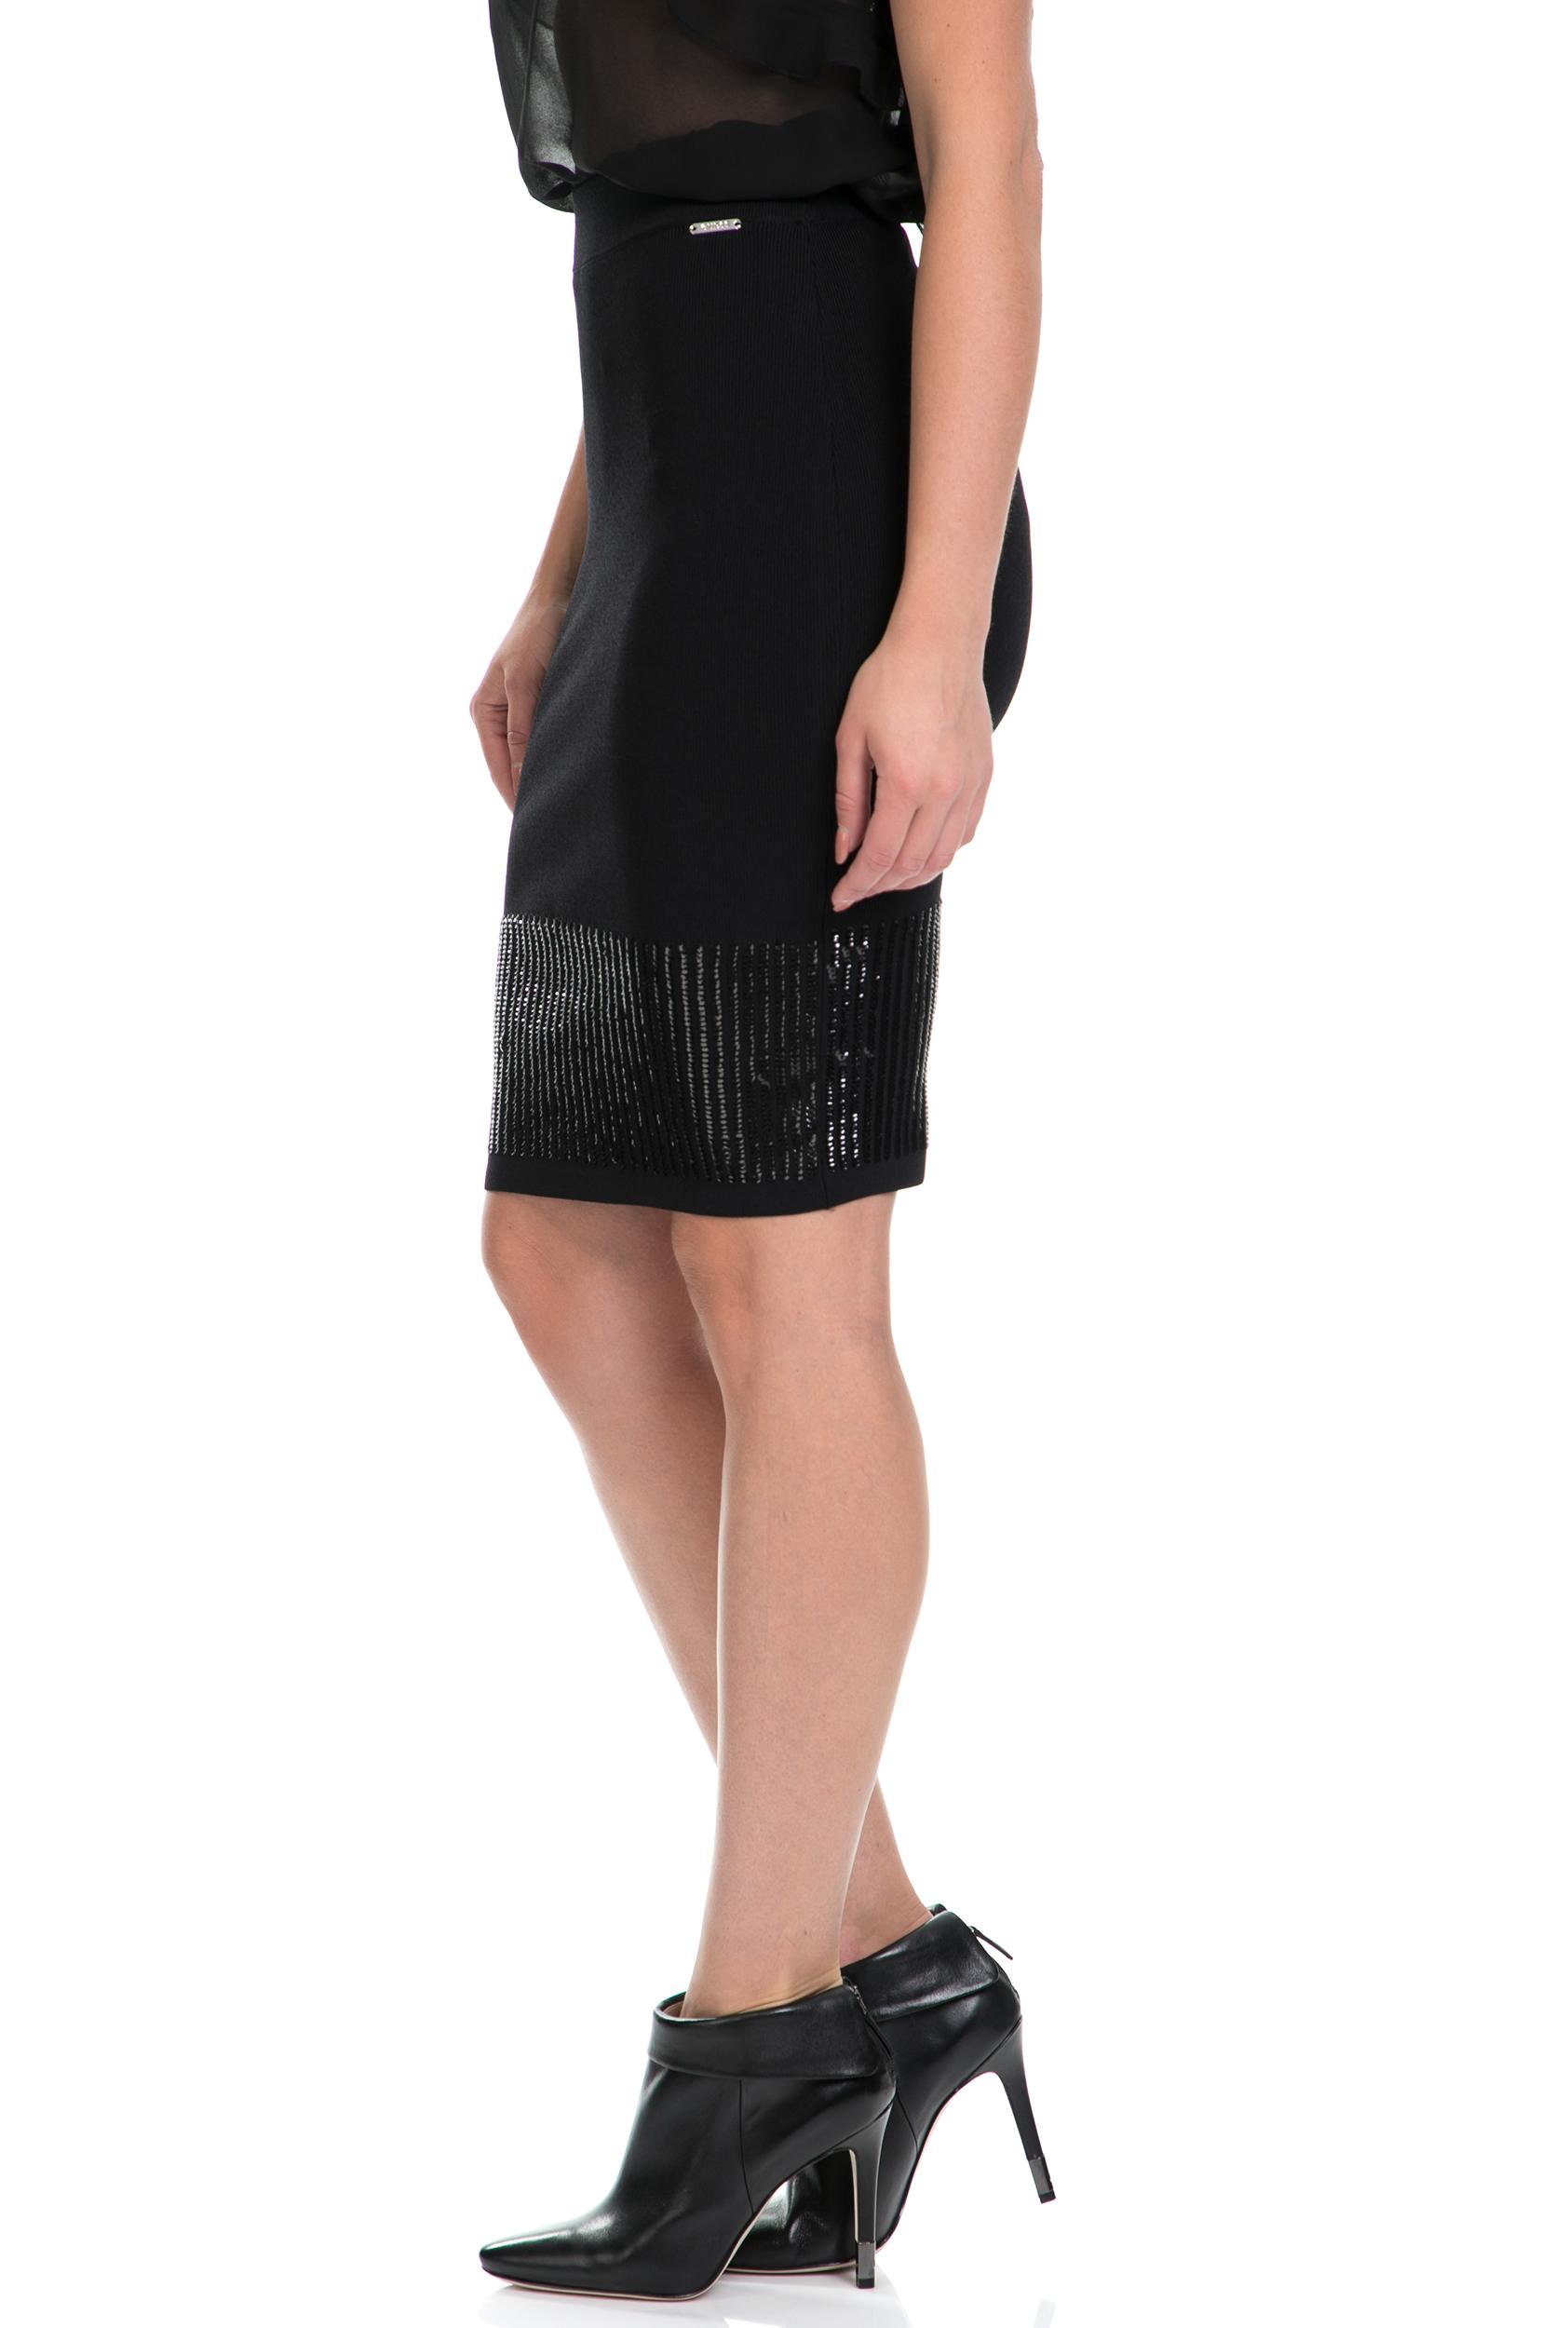 GUESS - Γυναικεία φούστα ANGIE GUESS μαύρη 15cacf6e004